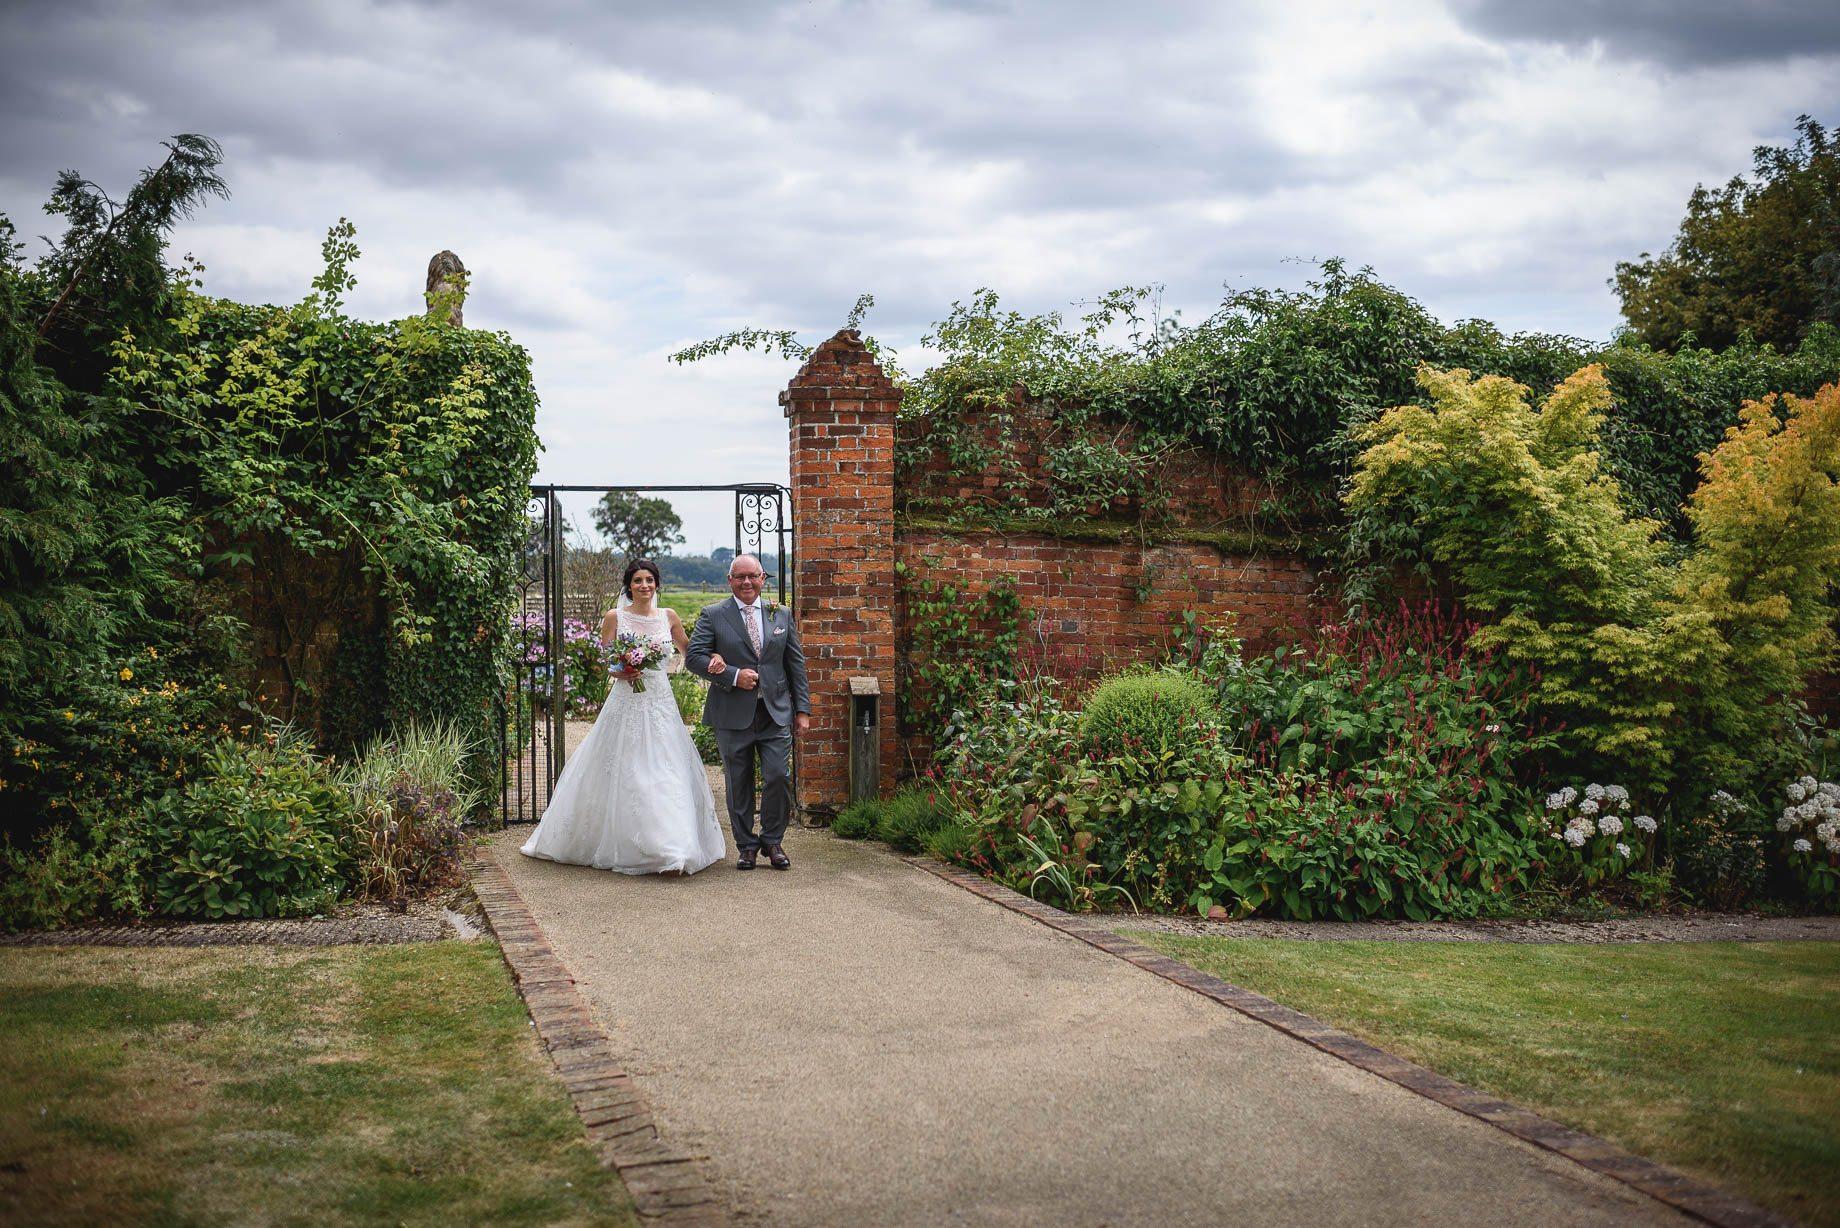 Gaynes Park wedding photography - Guy Collier Photography - Rachel and Jon (63 of 169)